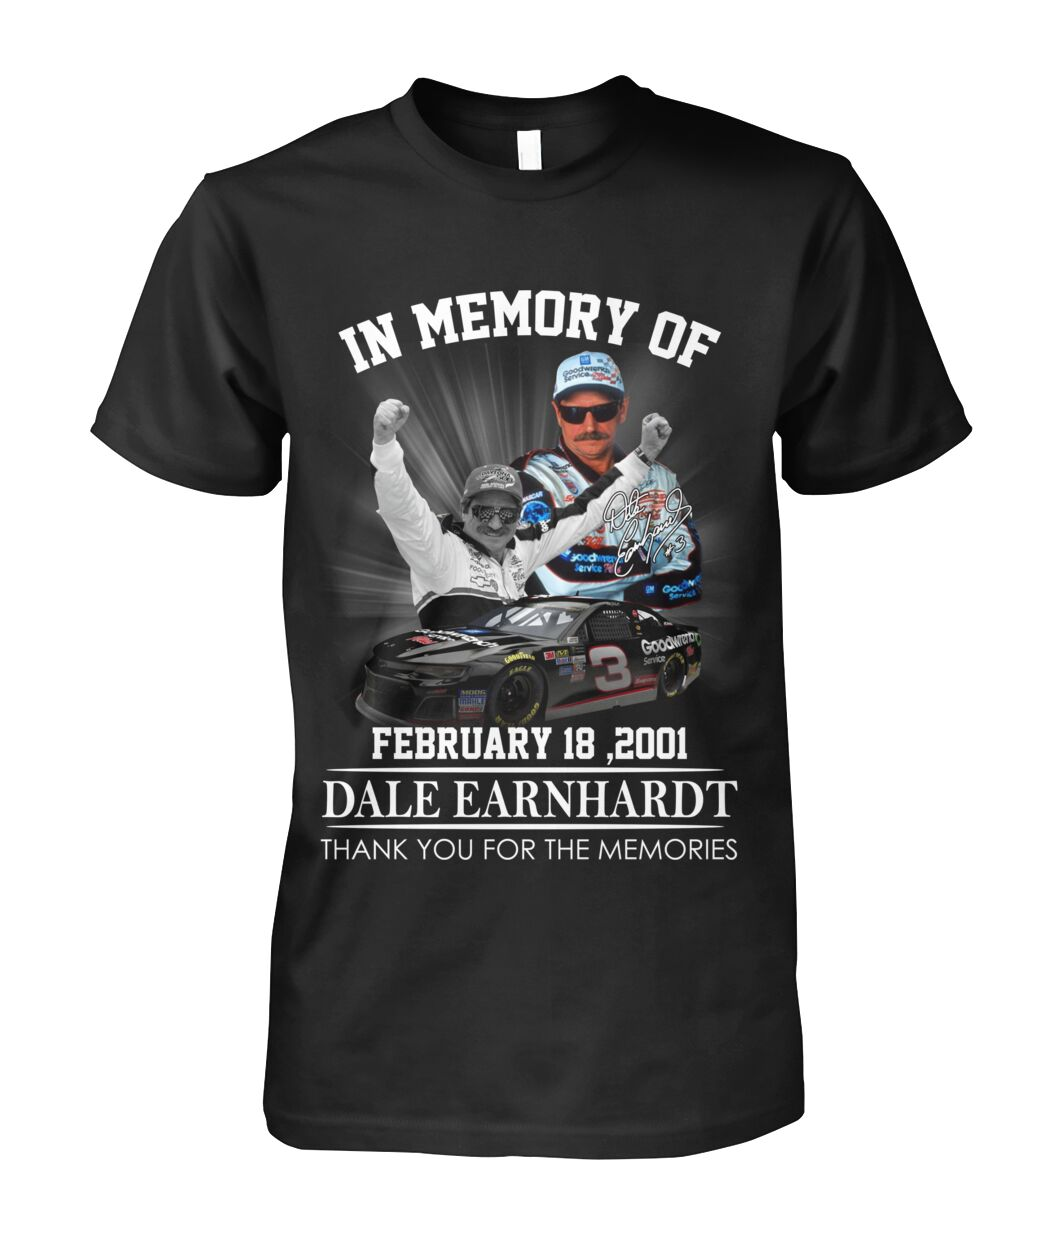 In memory of Dale Earnhardt February 18 2001 shirt